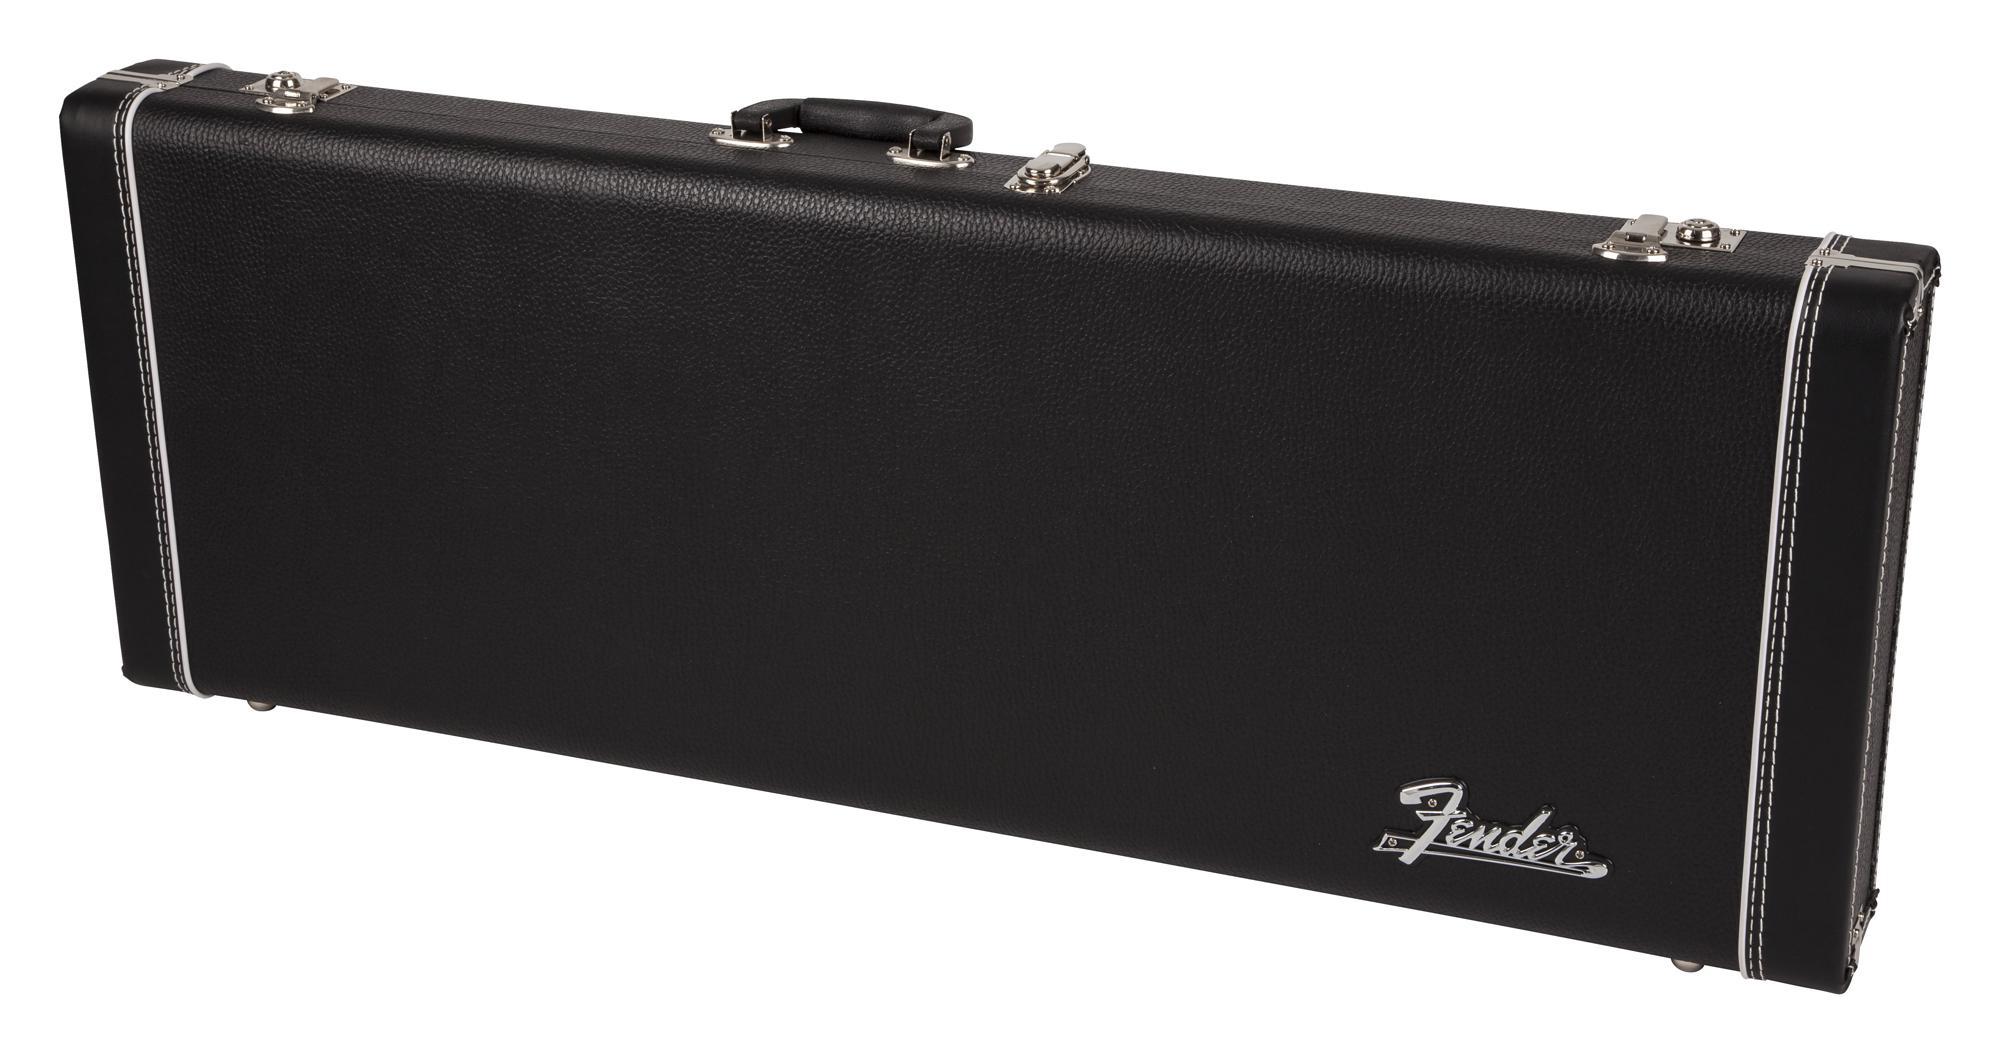 Fender Pro Series Case Strat|Tele BLK